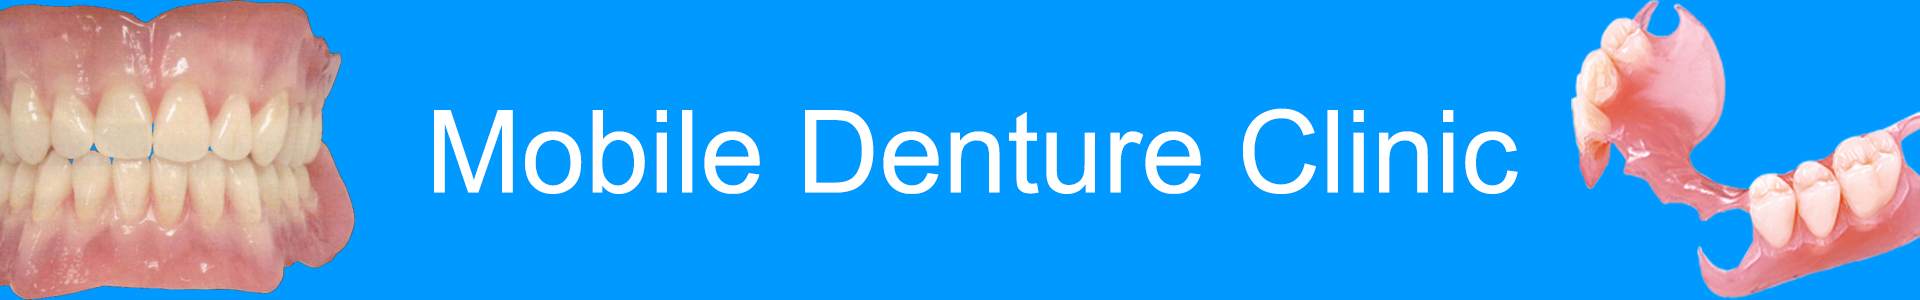 Mobile Denture Clinic Home